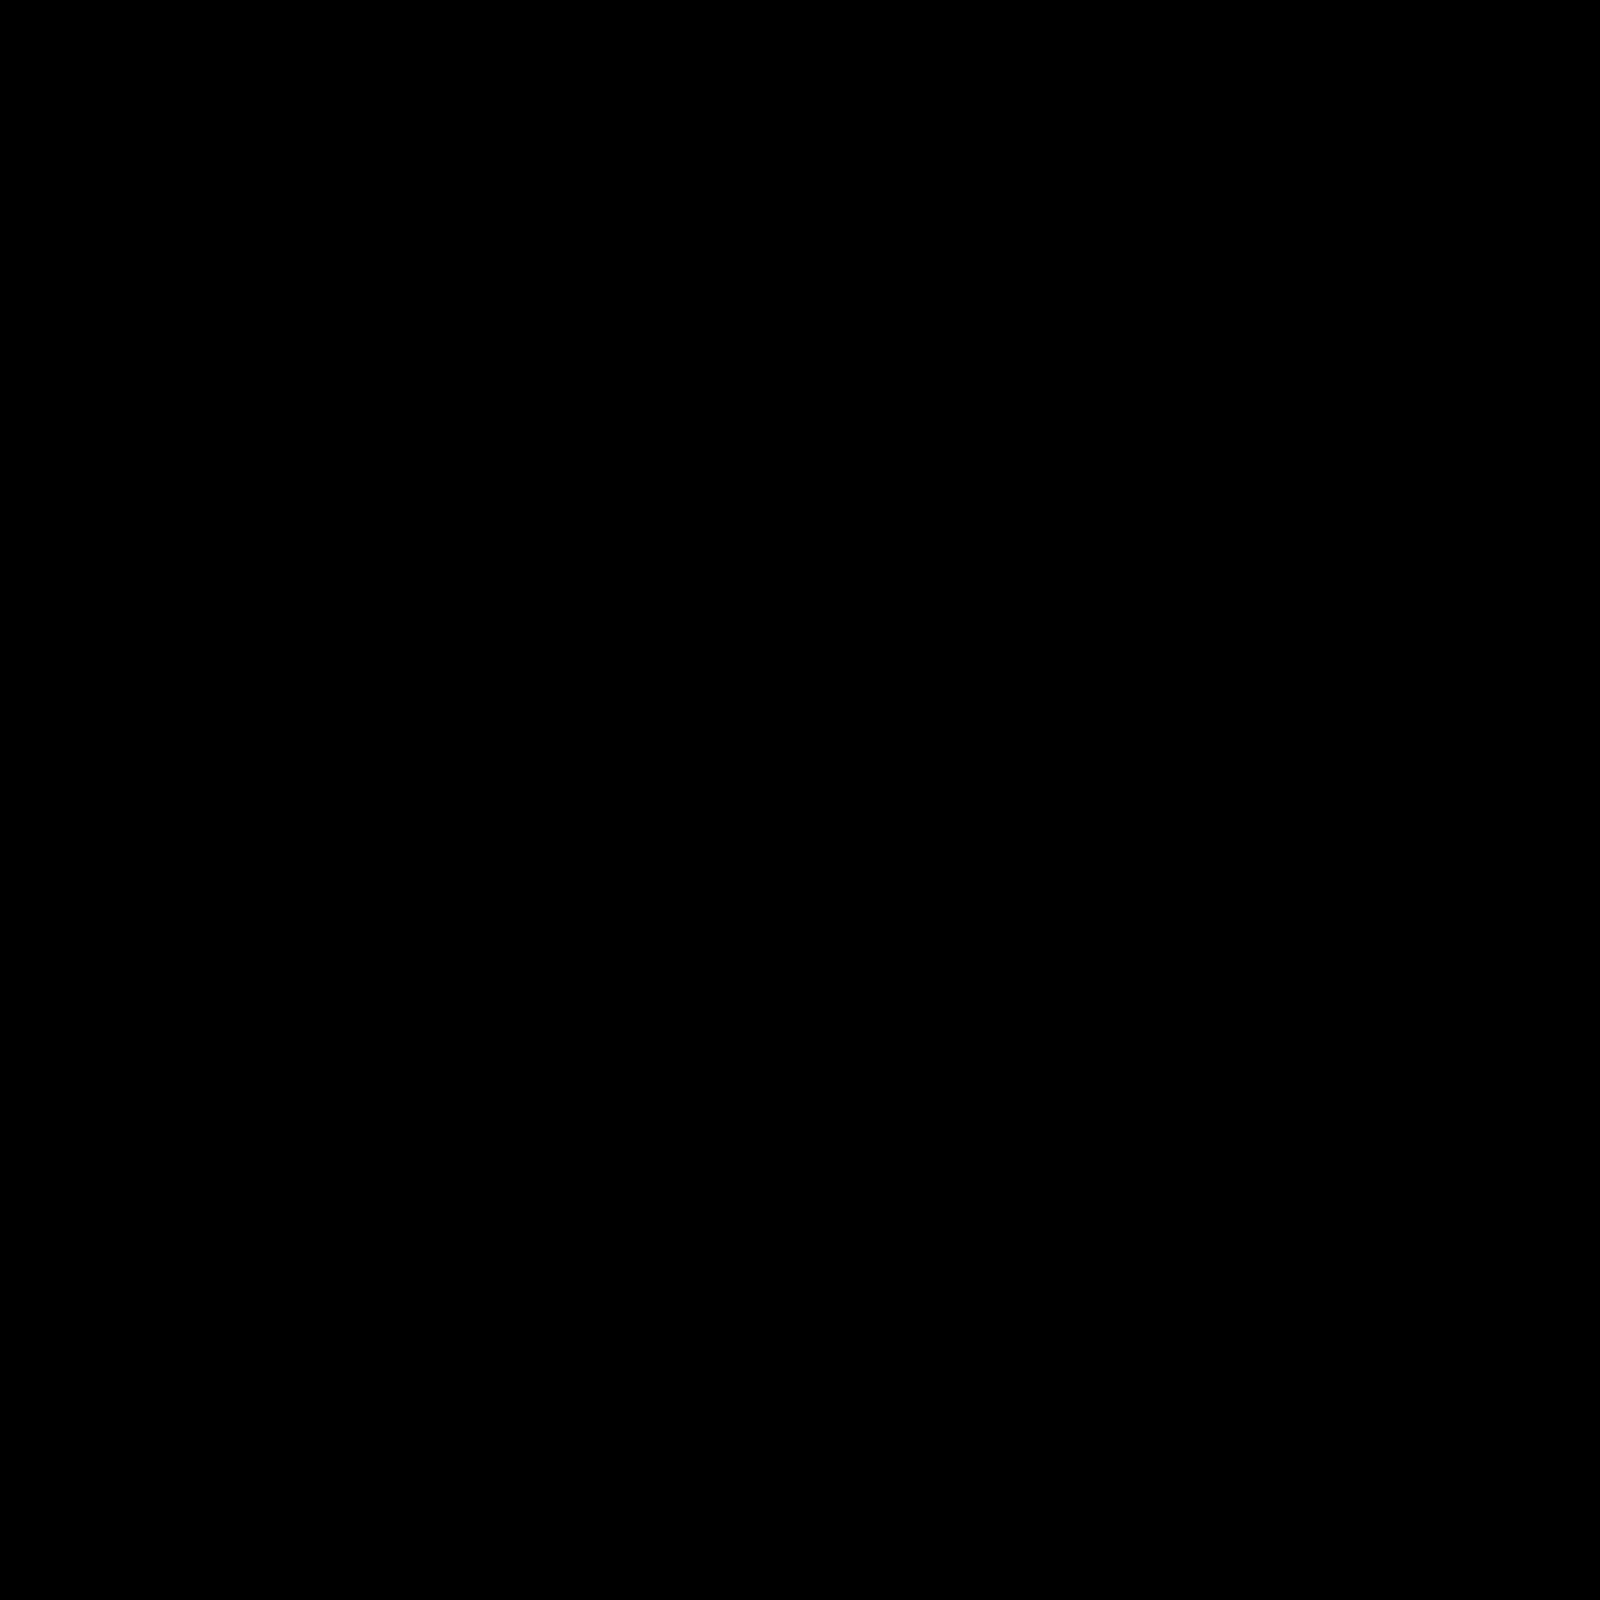 Light Dimming 100 Percent icon